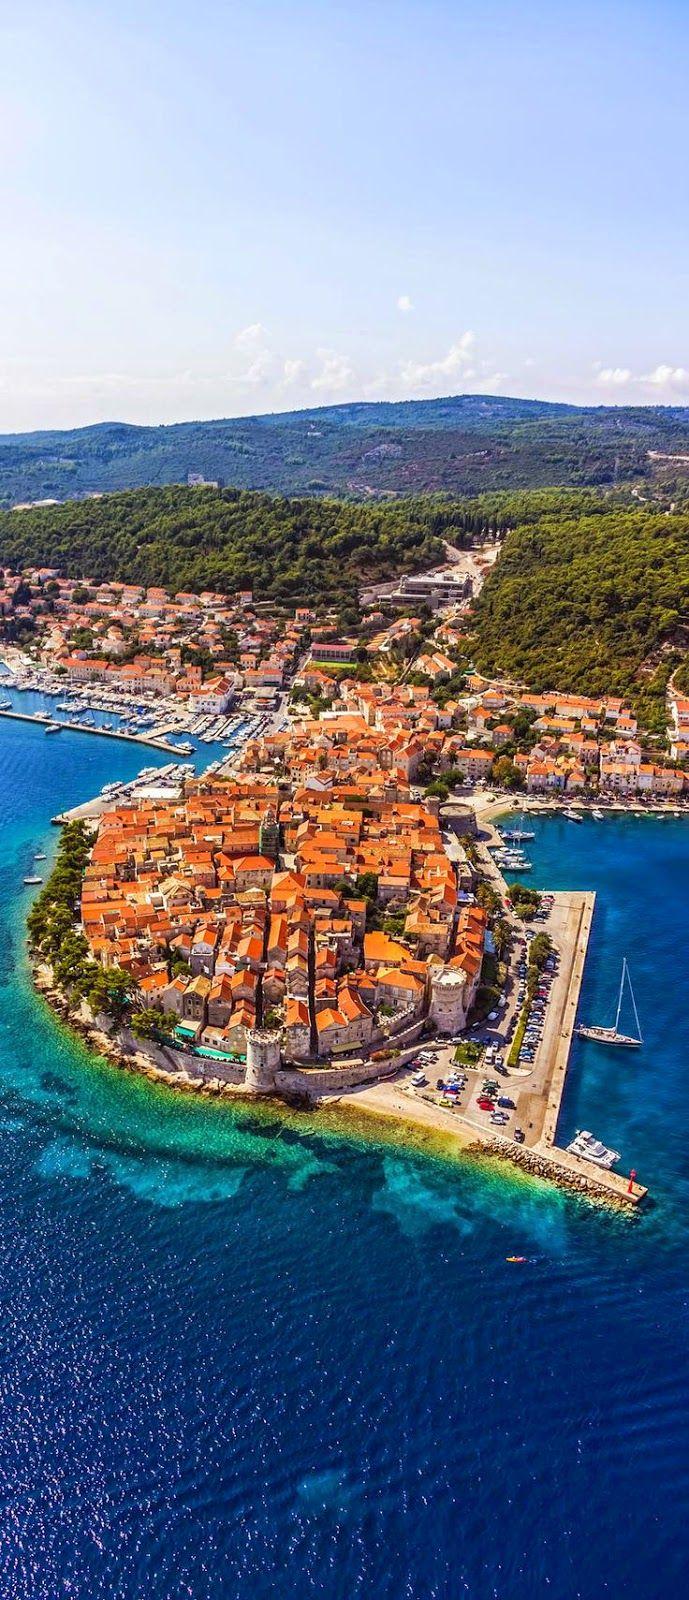 Amazing View of Korcula old town. Dubrovnik archipelago - Elaphites islands, Croatia